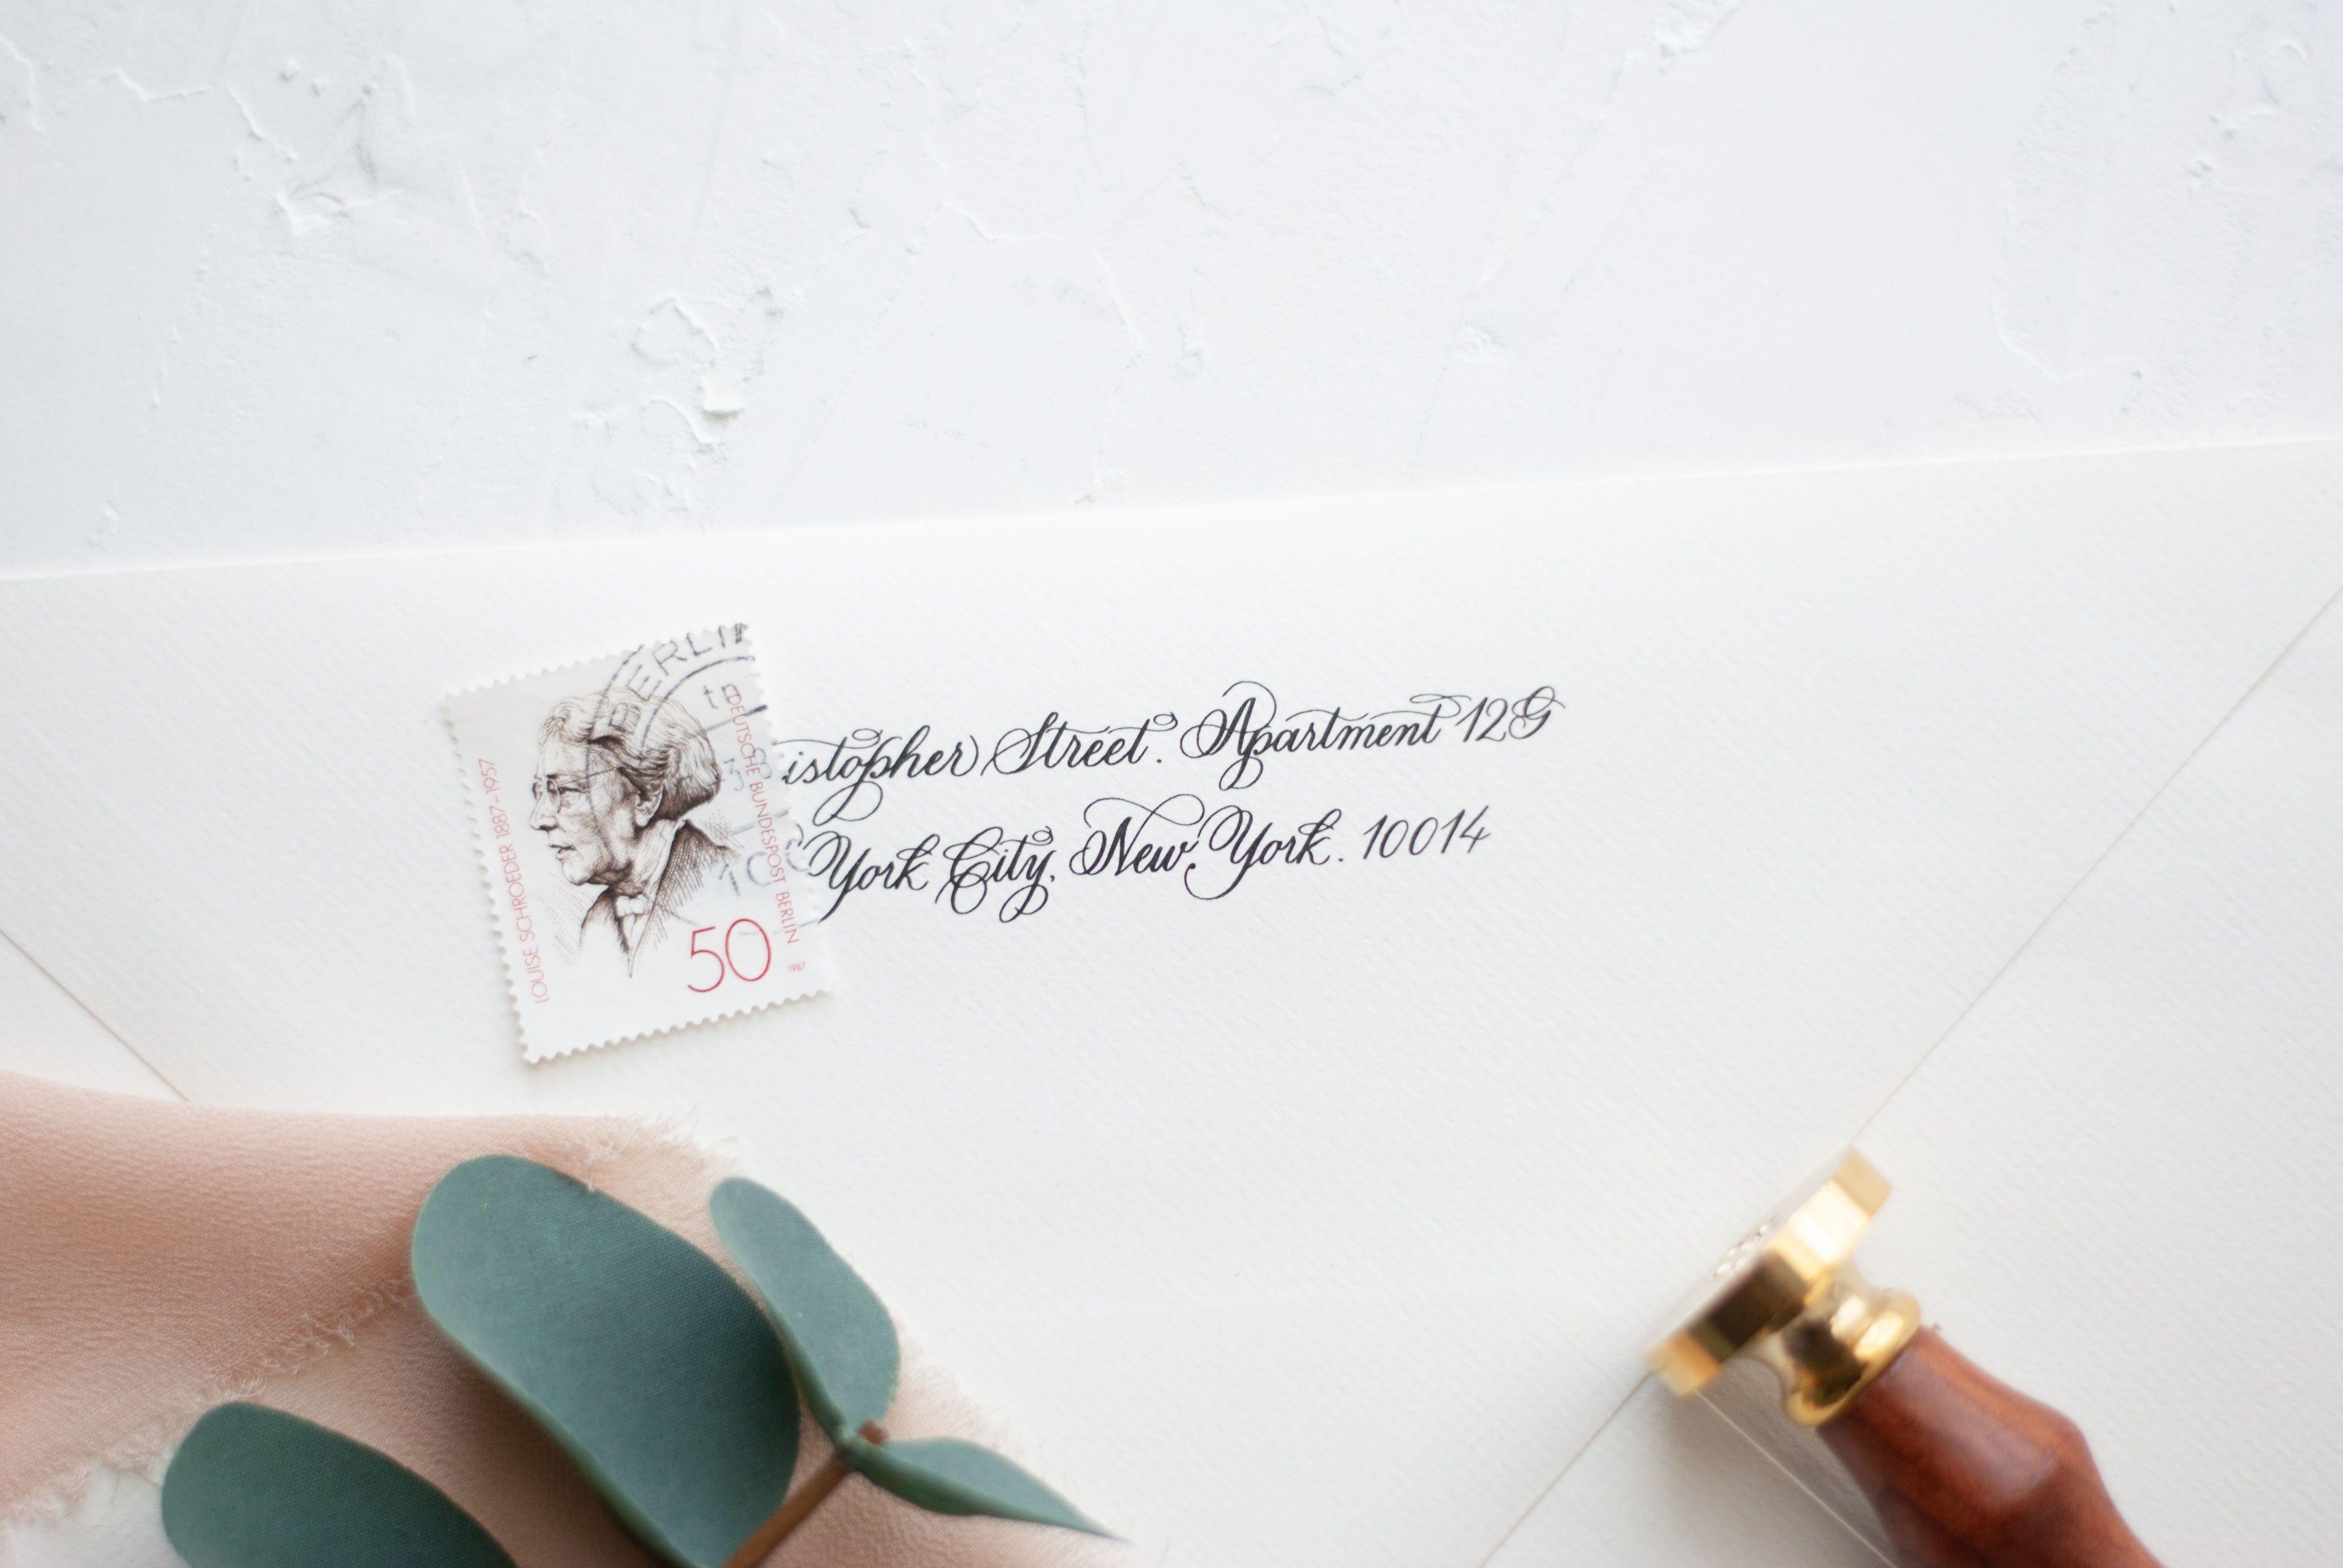 Printable Custom Return Address On Handmade Calligraphy Etsy Addressing Wedding Invitations Wedding Envelope Calligraphy Wedding Invitation Envelopes